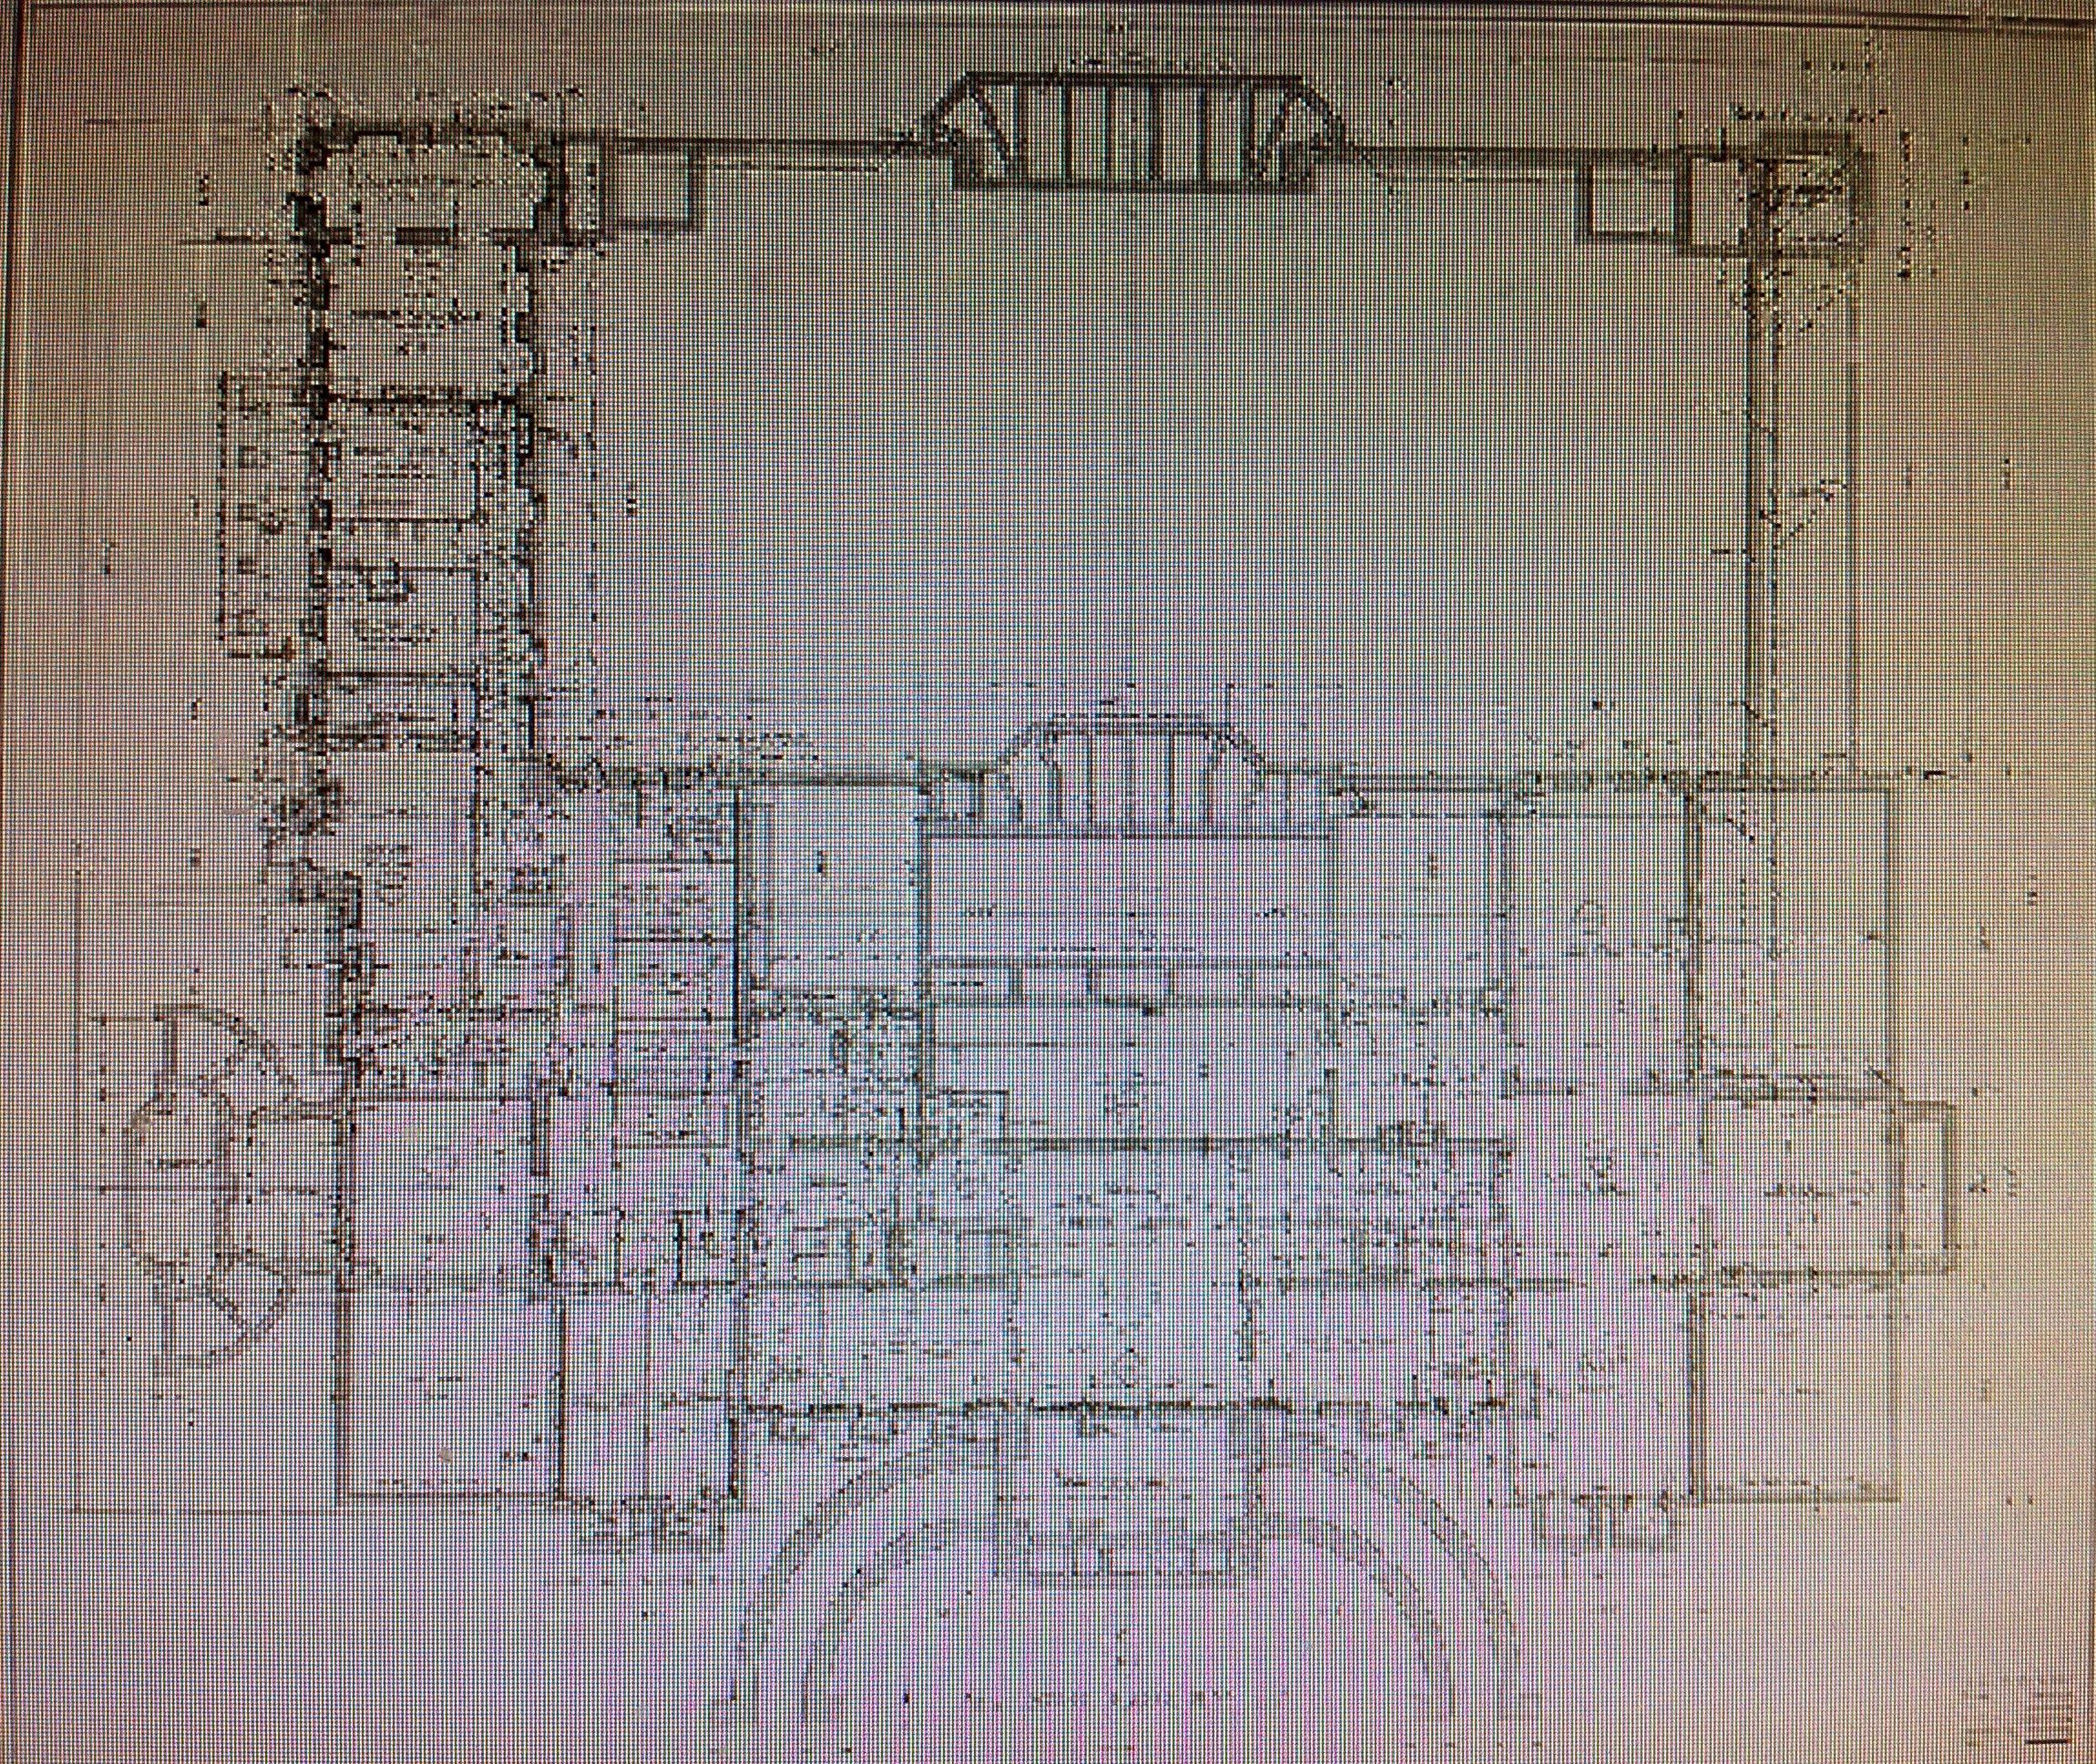 Whitemarsh Hall - Basement